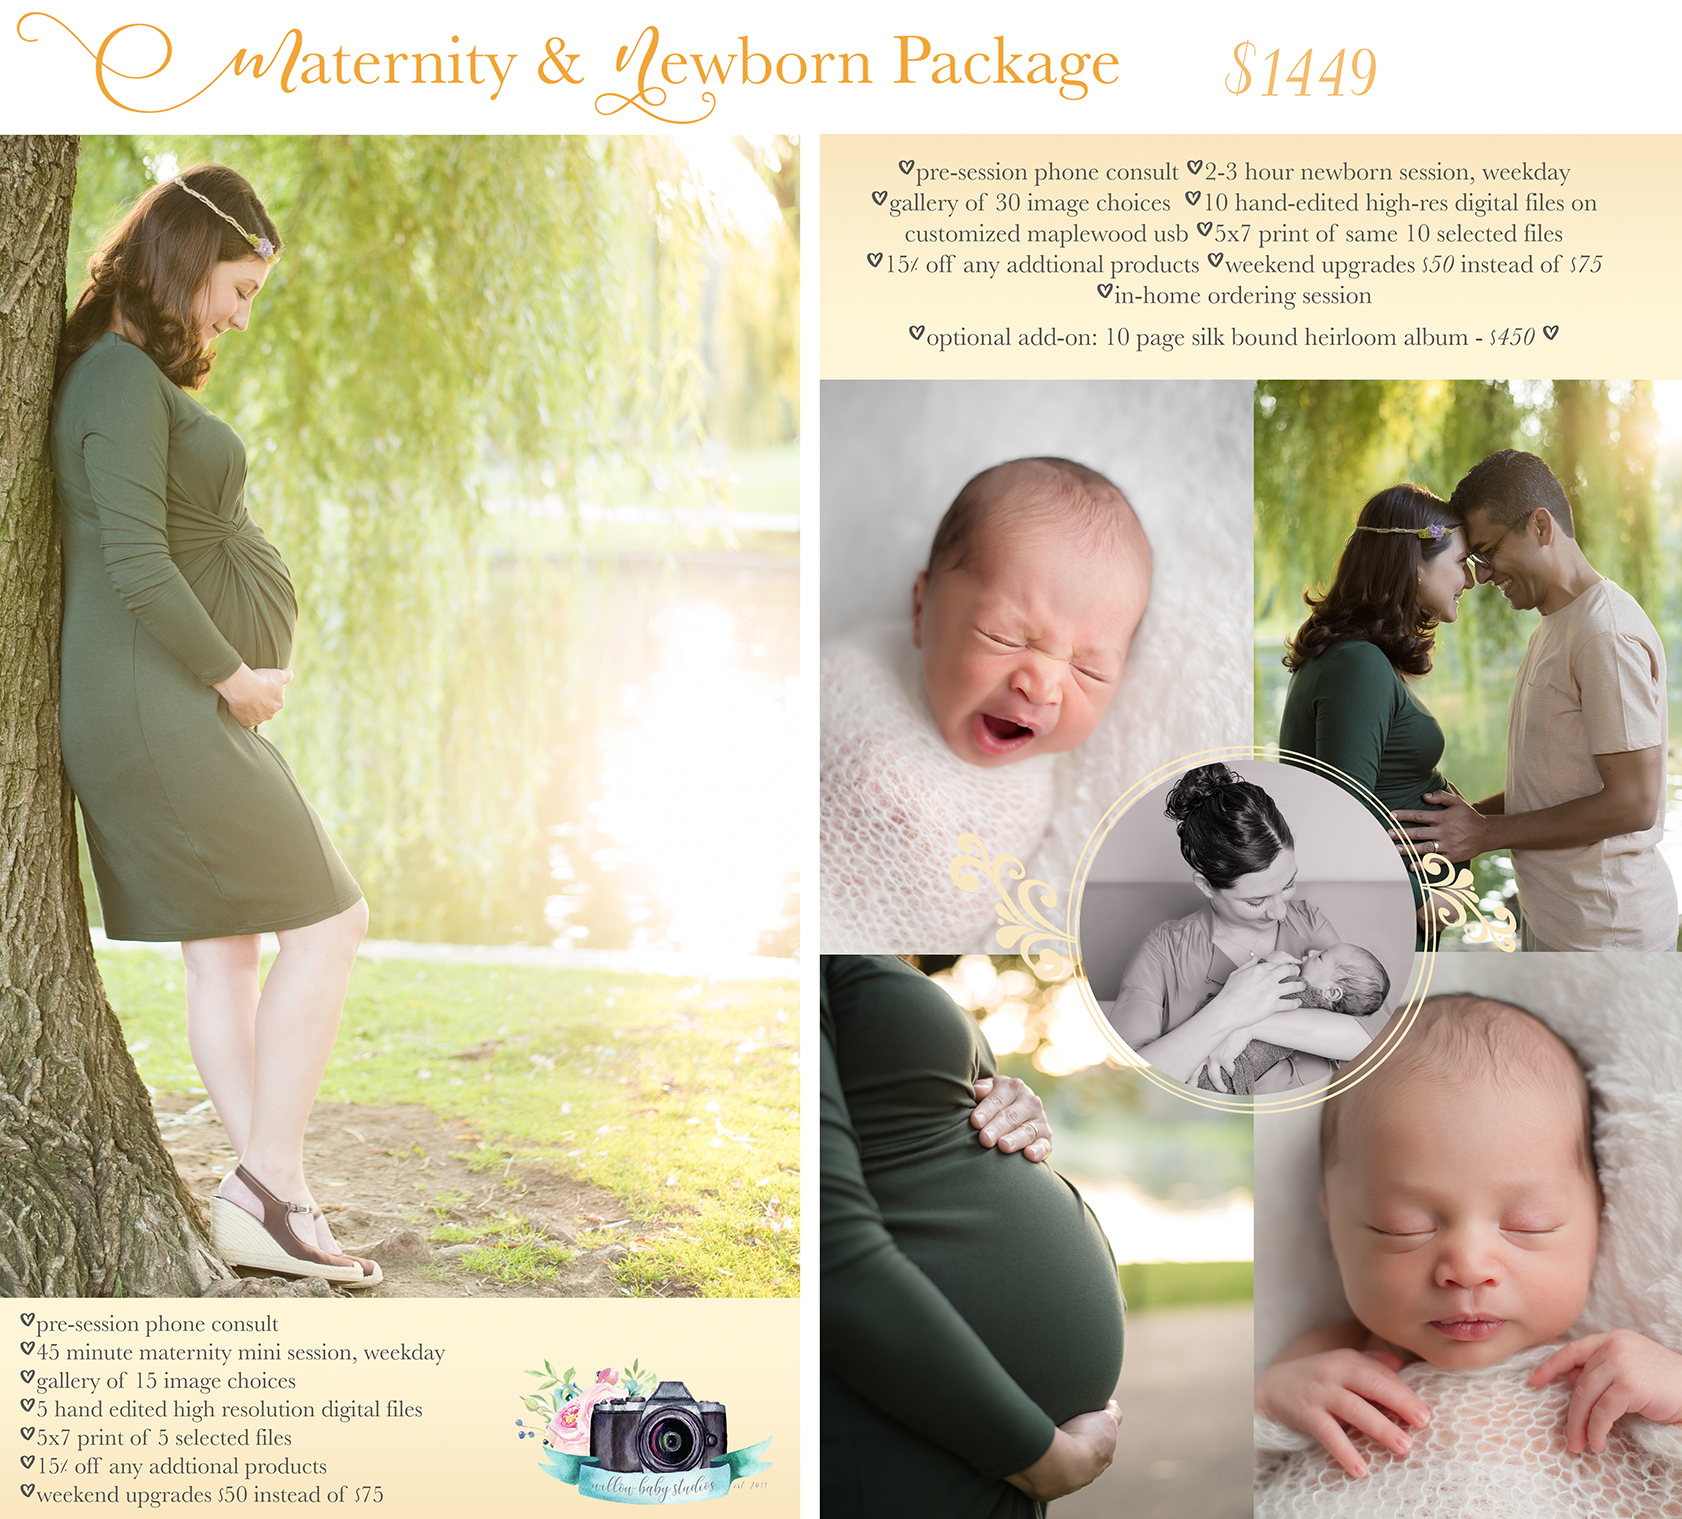 WBS Maternity&Newborn Package.jpg